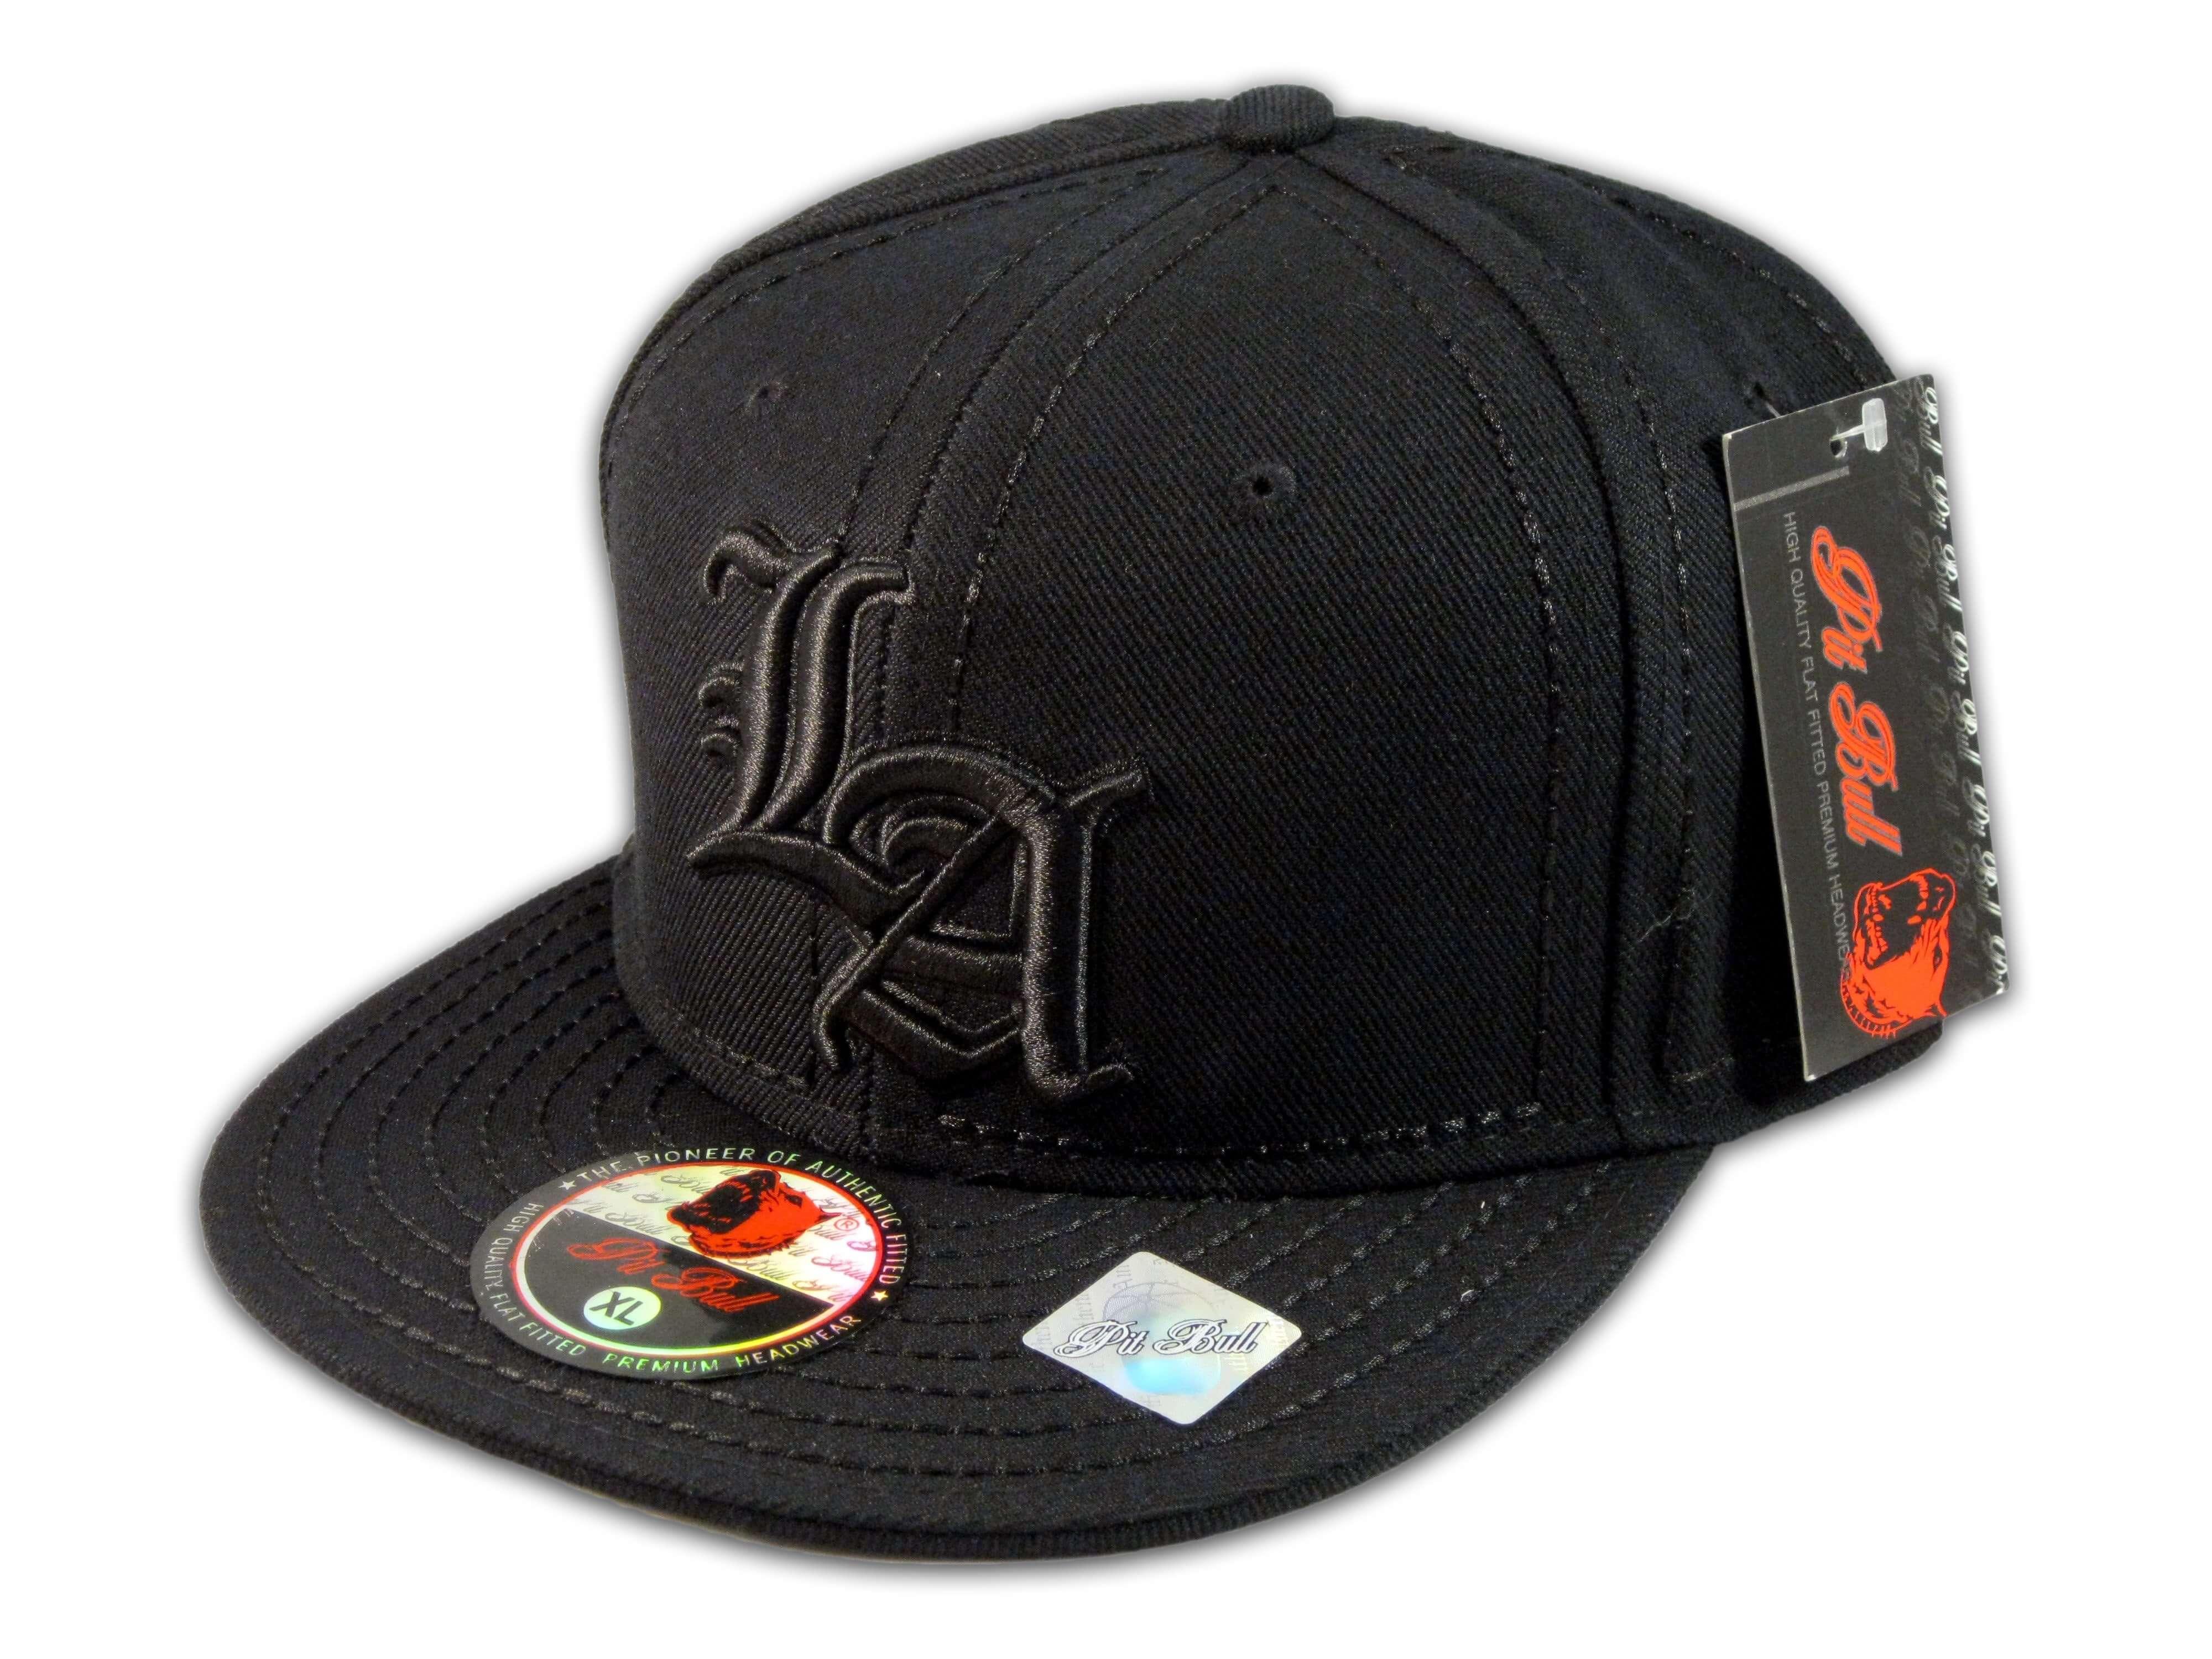 Los Angeles LA on Fitted Black Flat Brim Ball Cap Hip Hop Style Hat ... 817d5e01a60